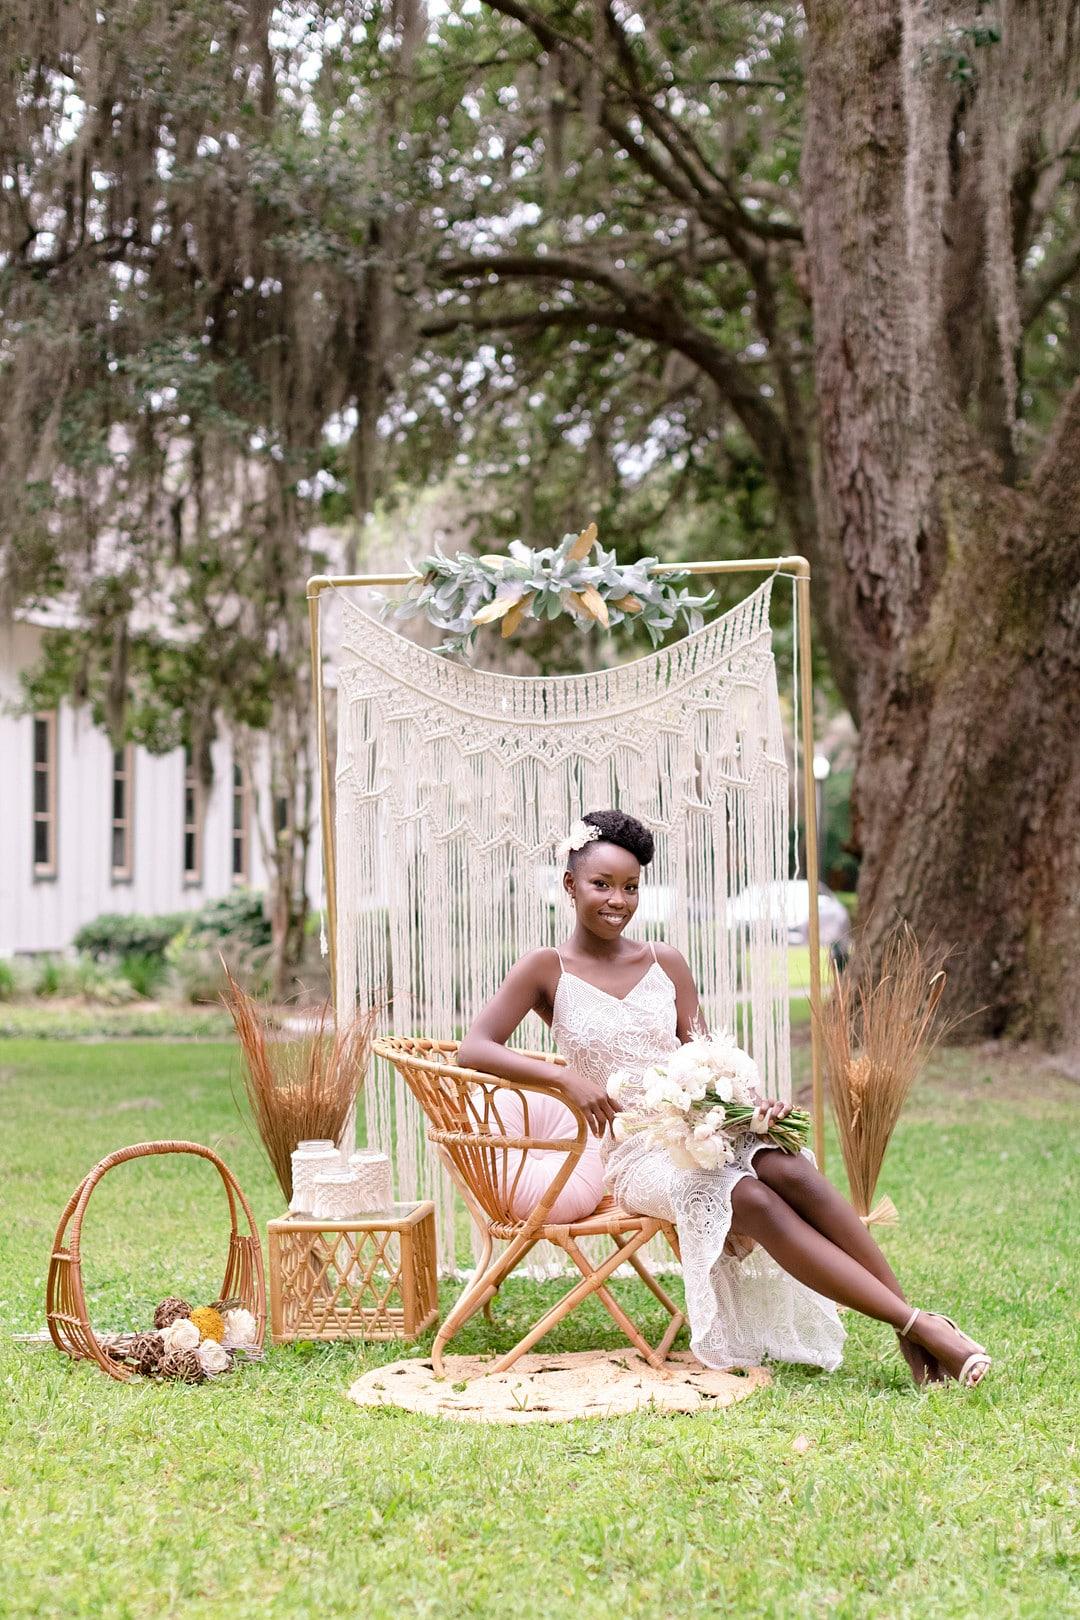 Elegant Boho Wedding Picnic_Susan Dixon Photography, LLC_susan-dixon-018_low